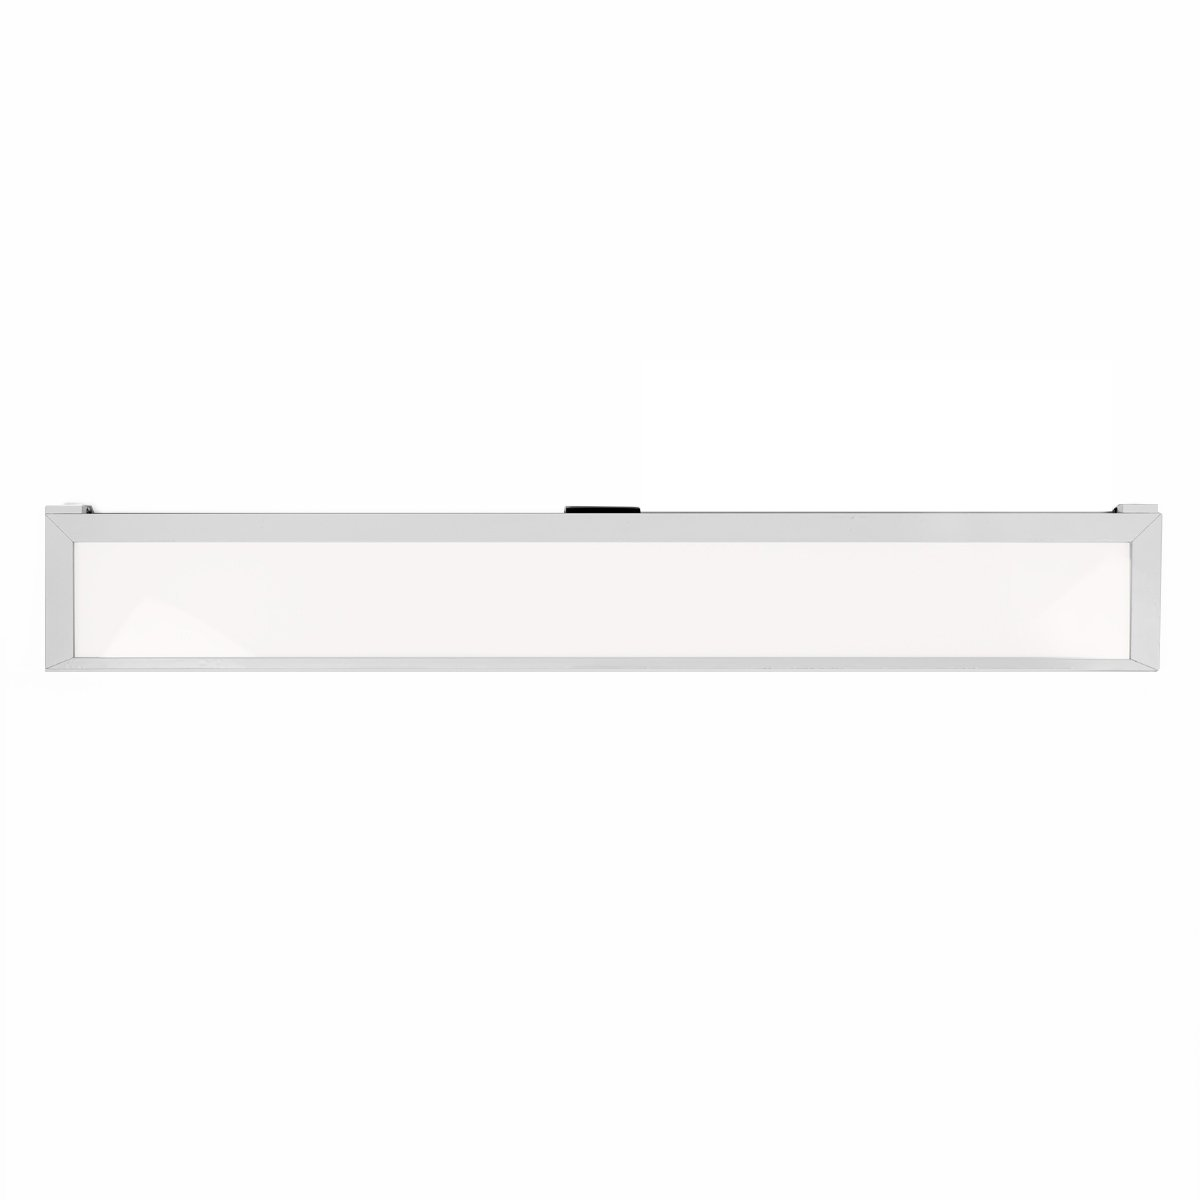 WAC Lighting LN-LED30P-27-WT Contemporary LINE 2.0 LED Undercabinet Light